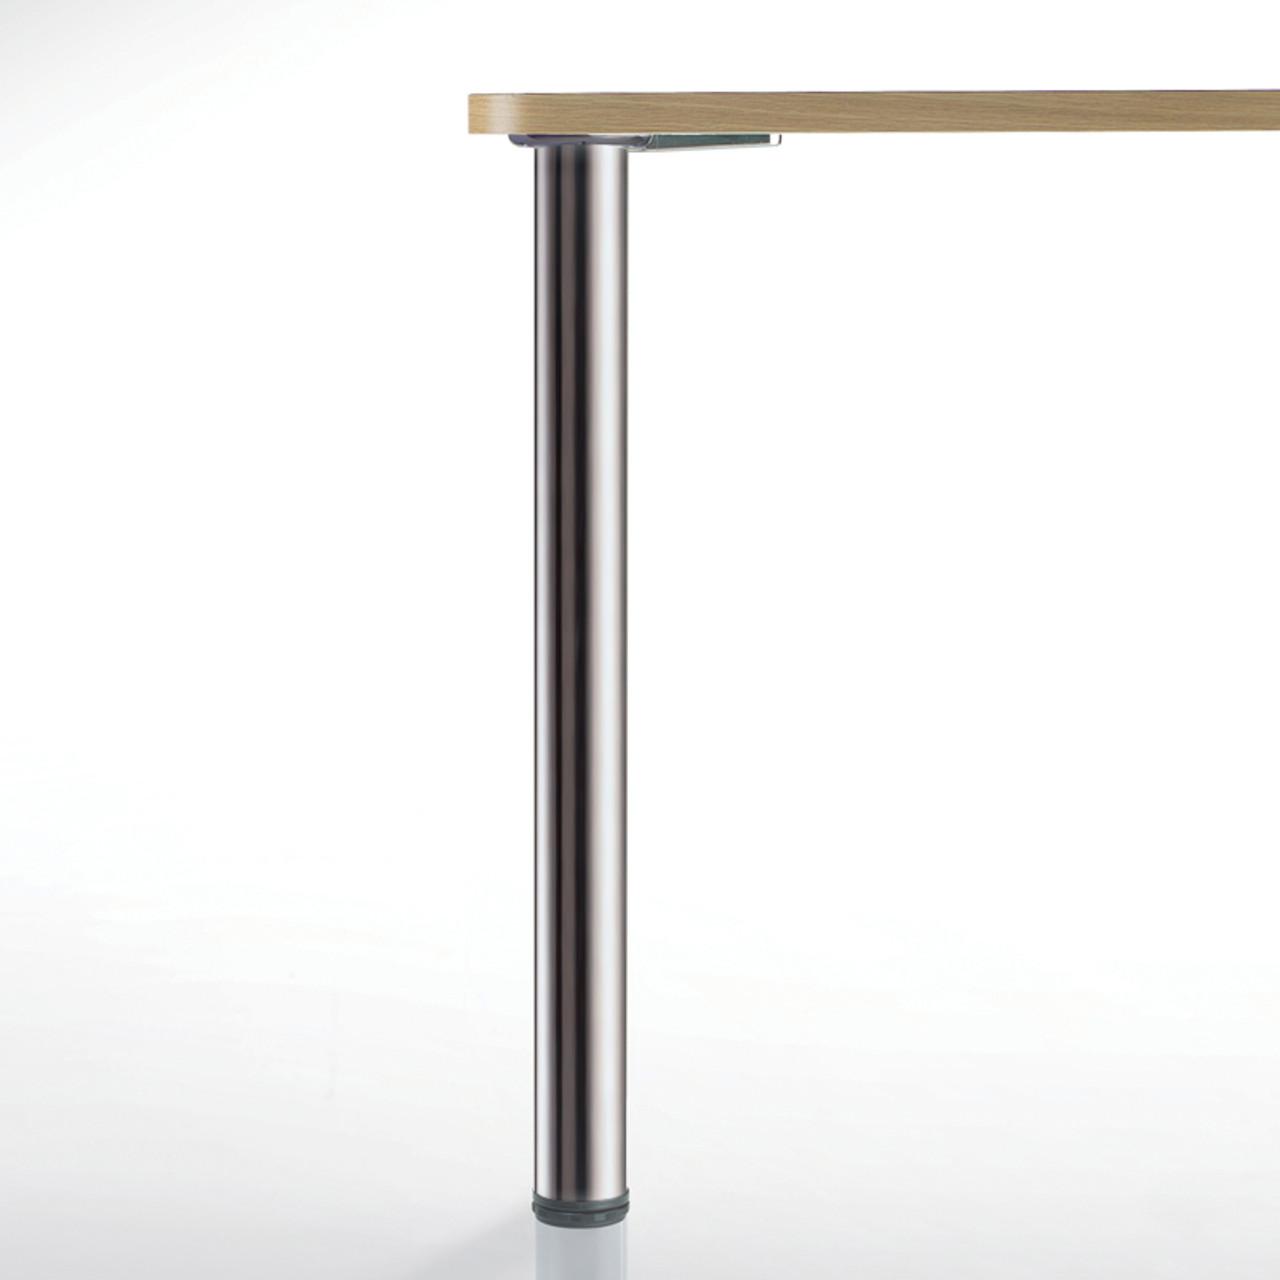 Hamburg Table Leg, Brushed Steel, 34-1/4'', 2-3/8'' diameter leg 1-1/8'' adjustable foot - replacementtablelegs.com